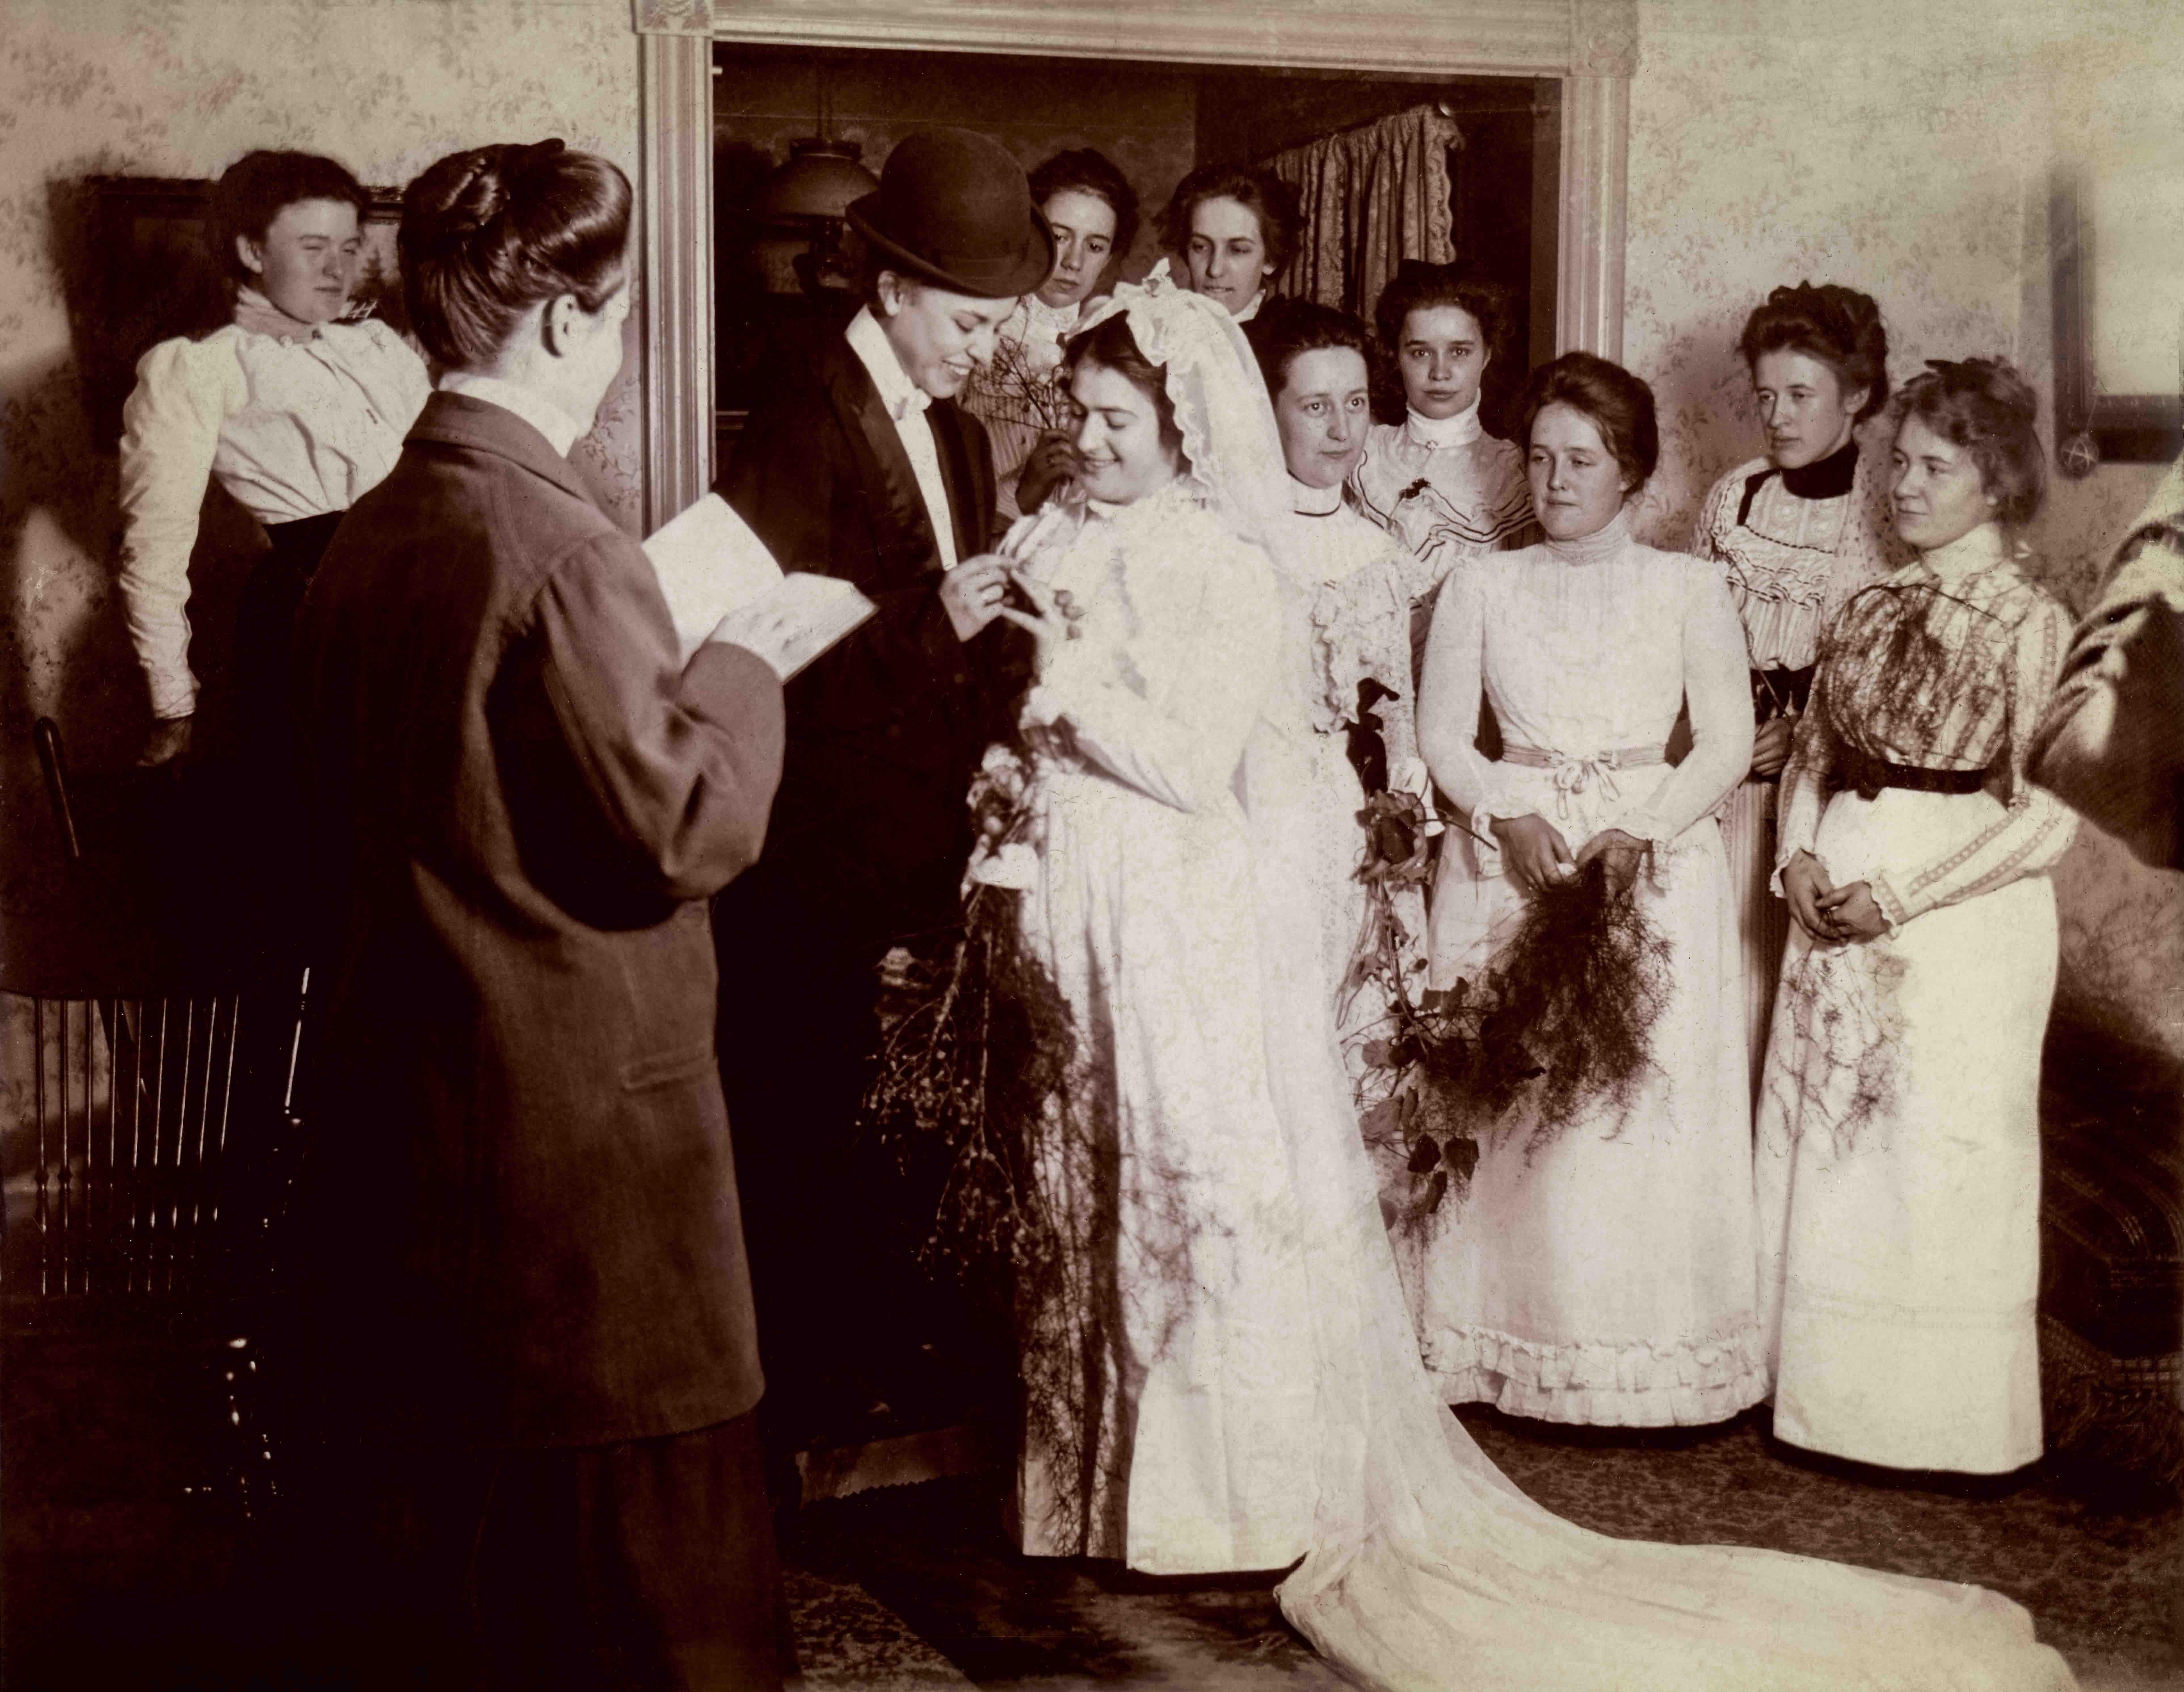 Mock wedding, United States, circa 1900. © Sebastian Lifshitz Collection